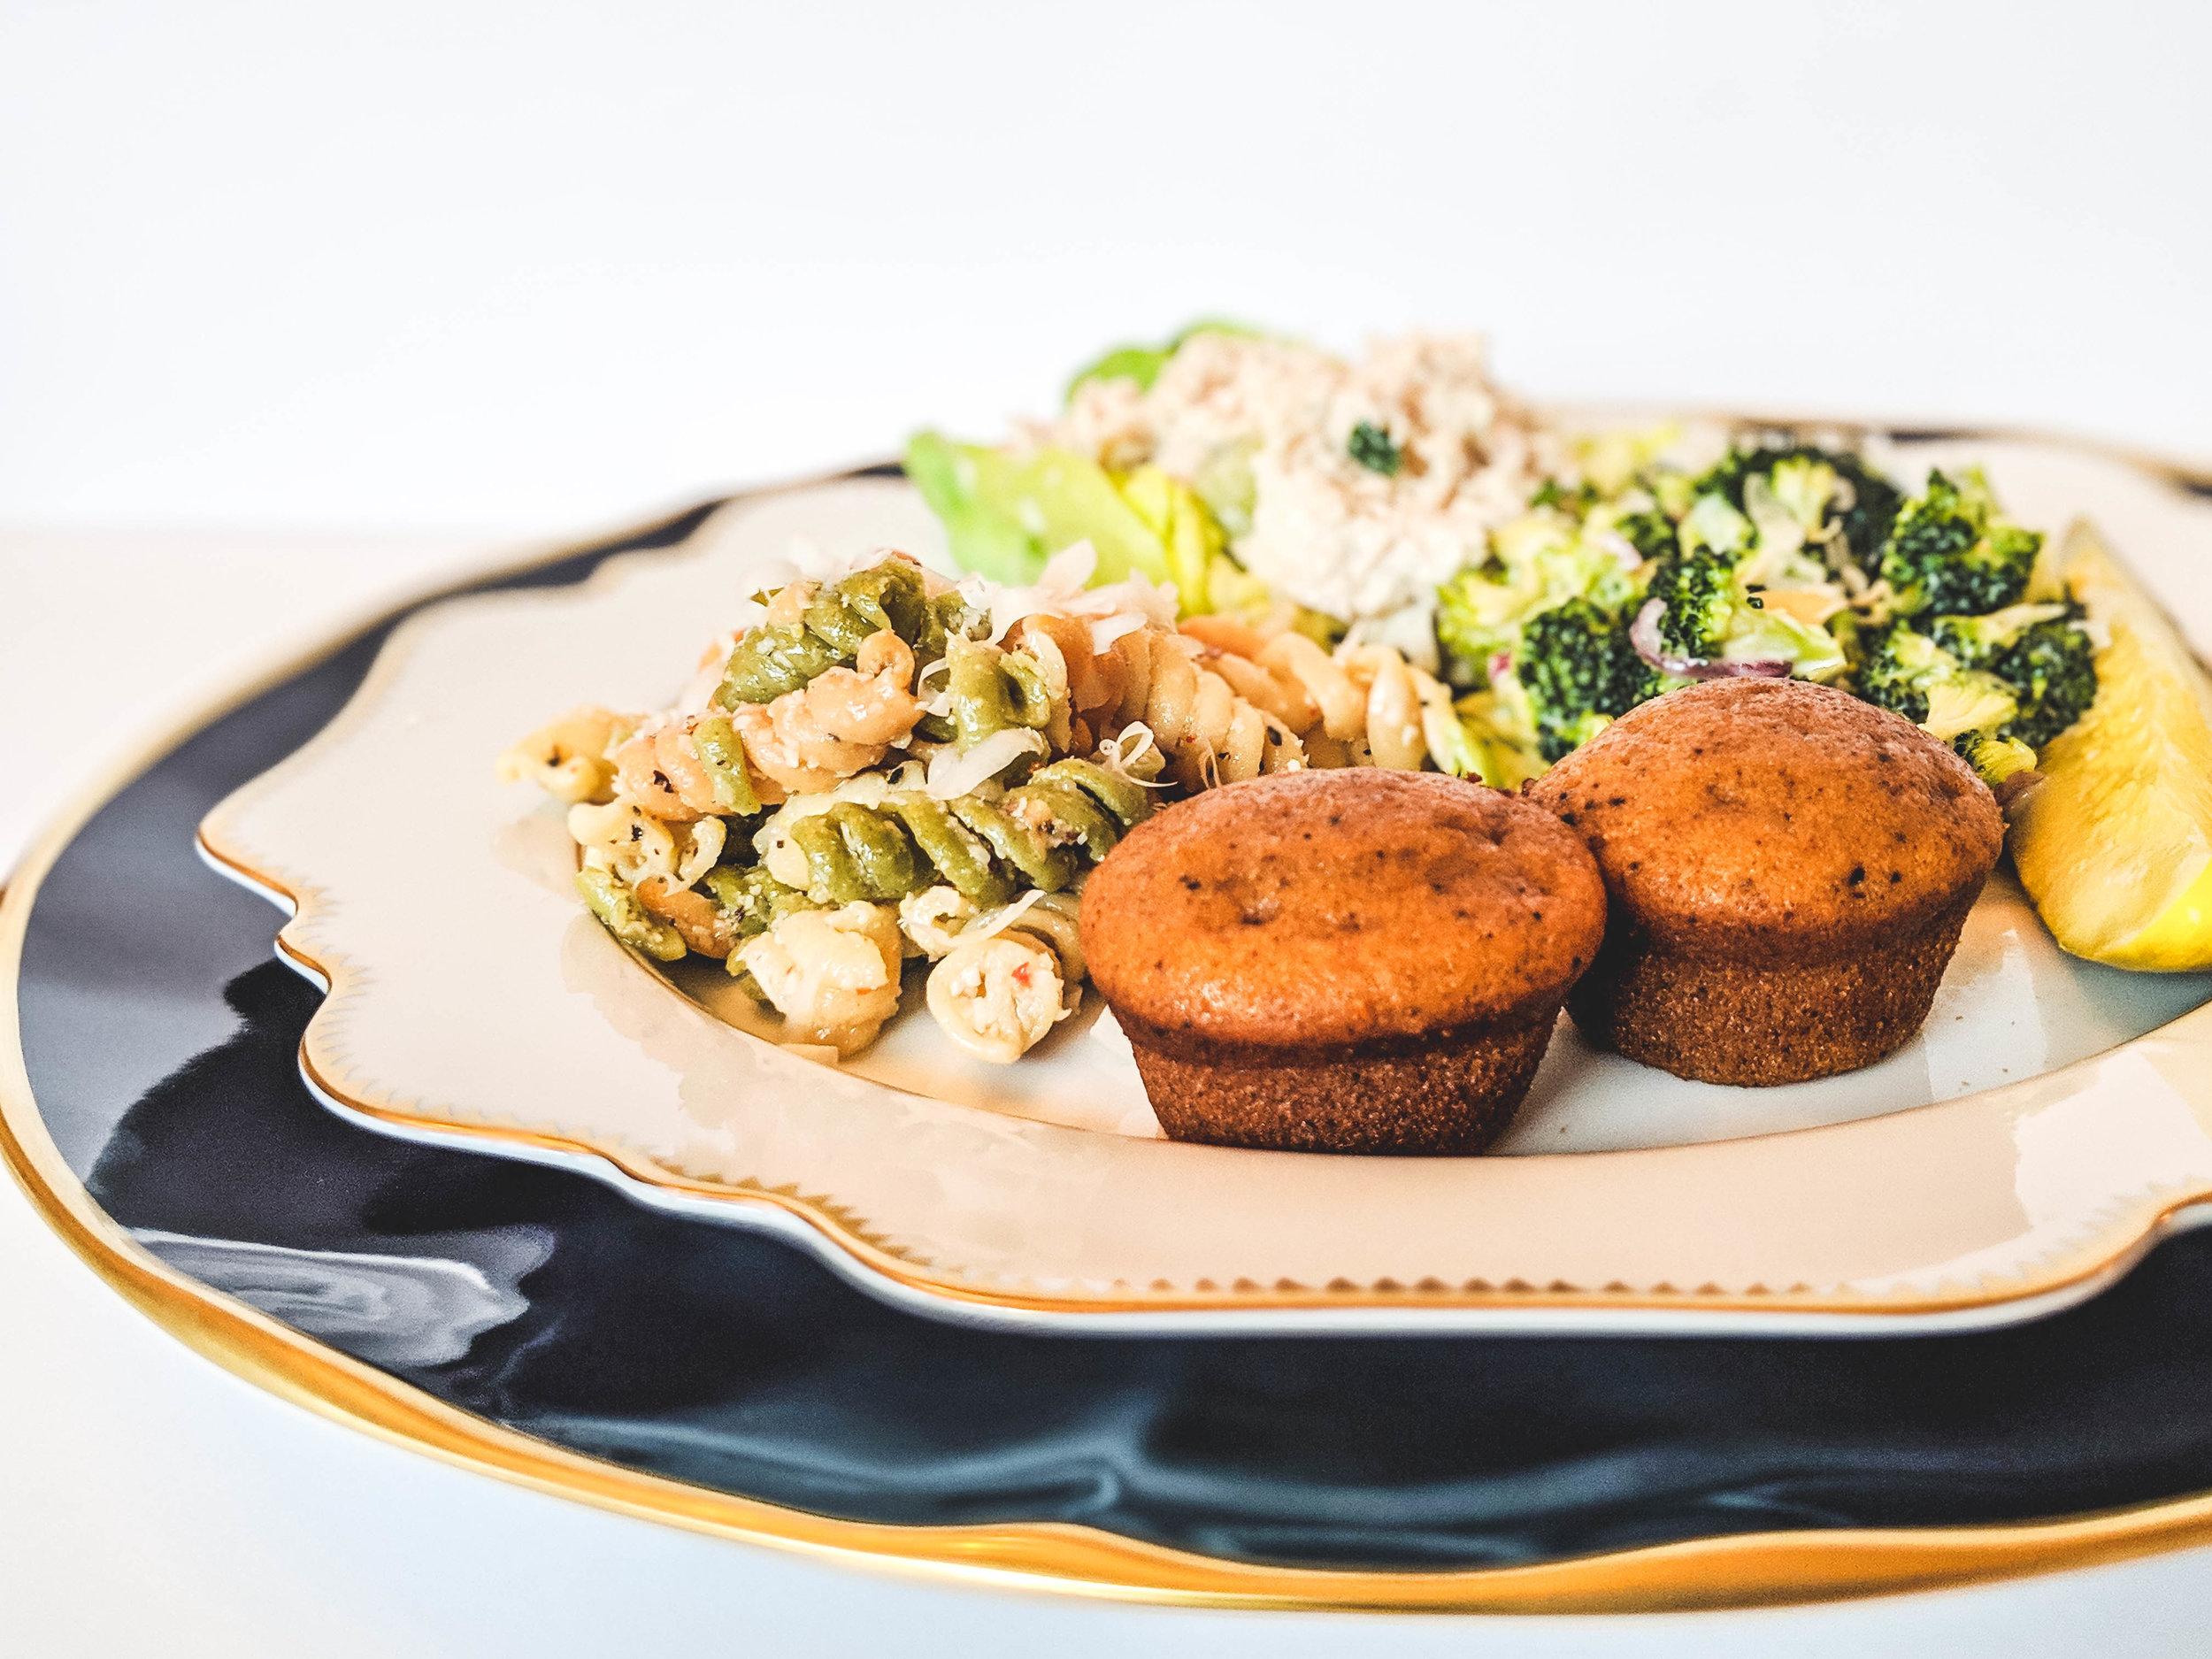 Copy of chicken salad plate